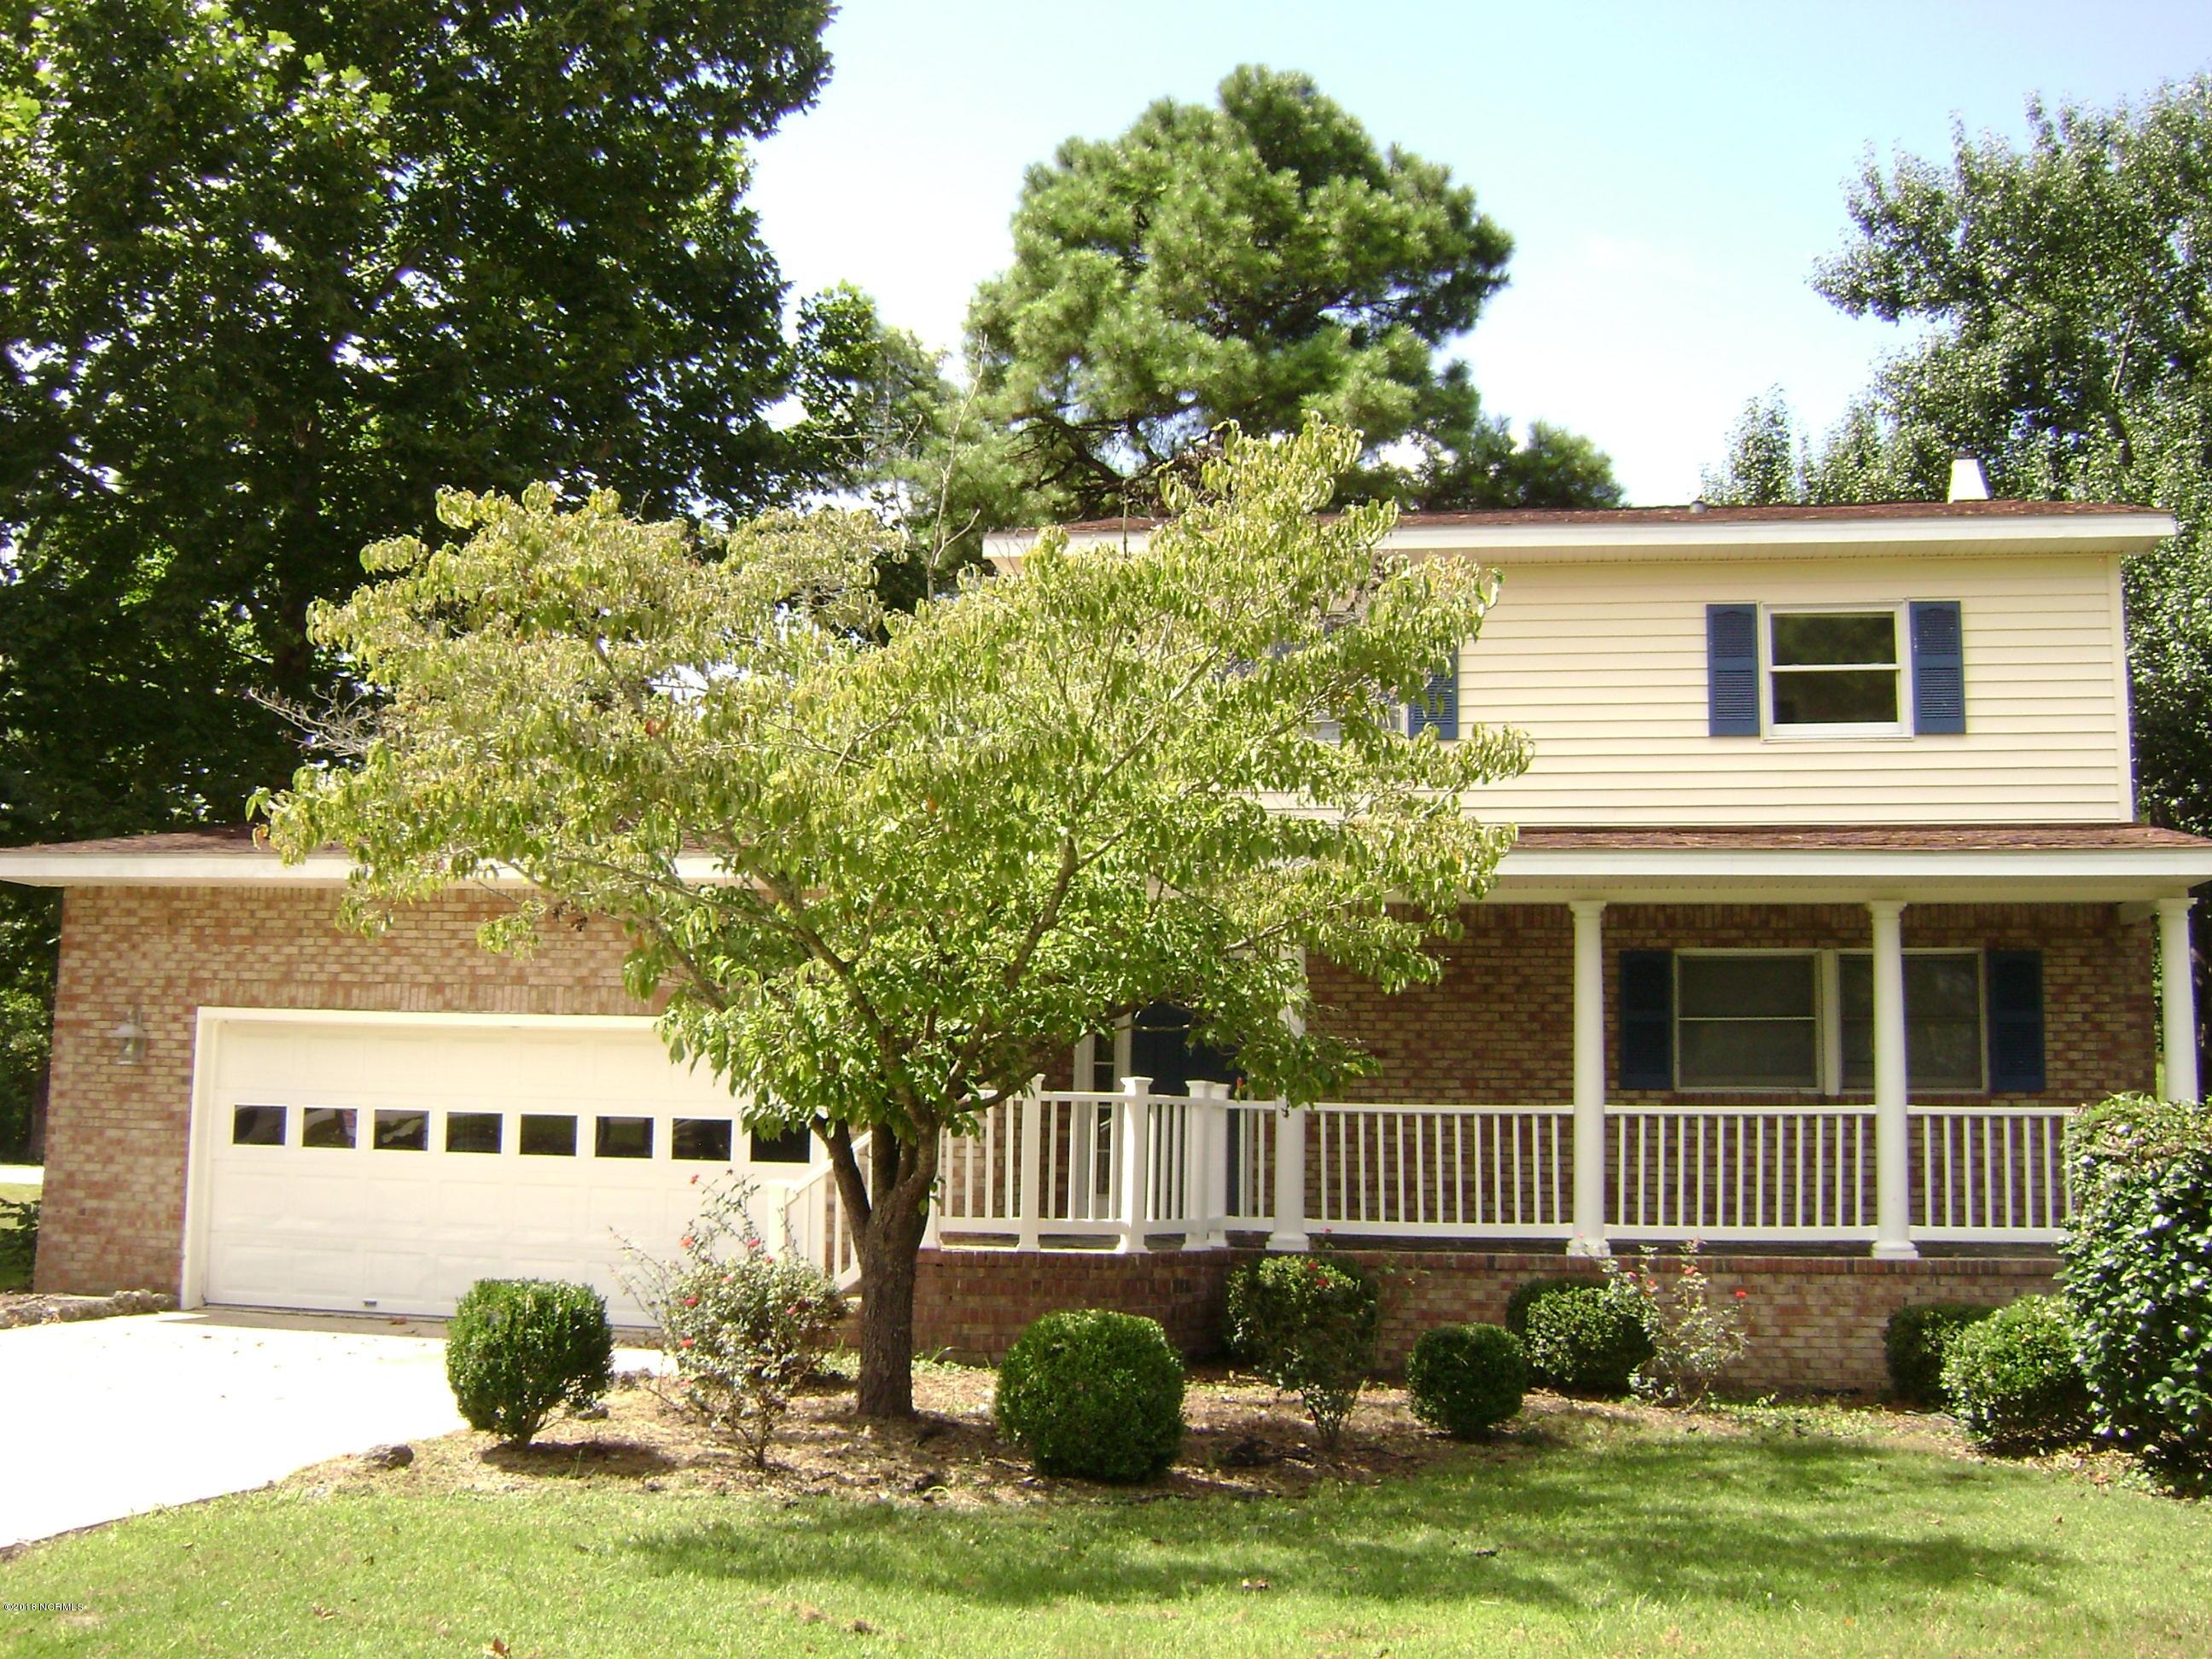 6202 Pelican Drive,New Bern,North Carolina,4 Bedrooms Bedrooms,6 Rooms Rooms,2 BathroomsBathrooms,Single family residence,Pelican,100128366